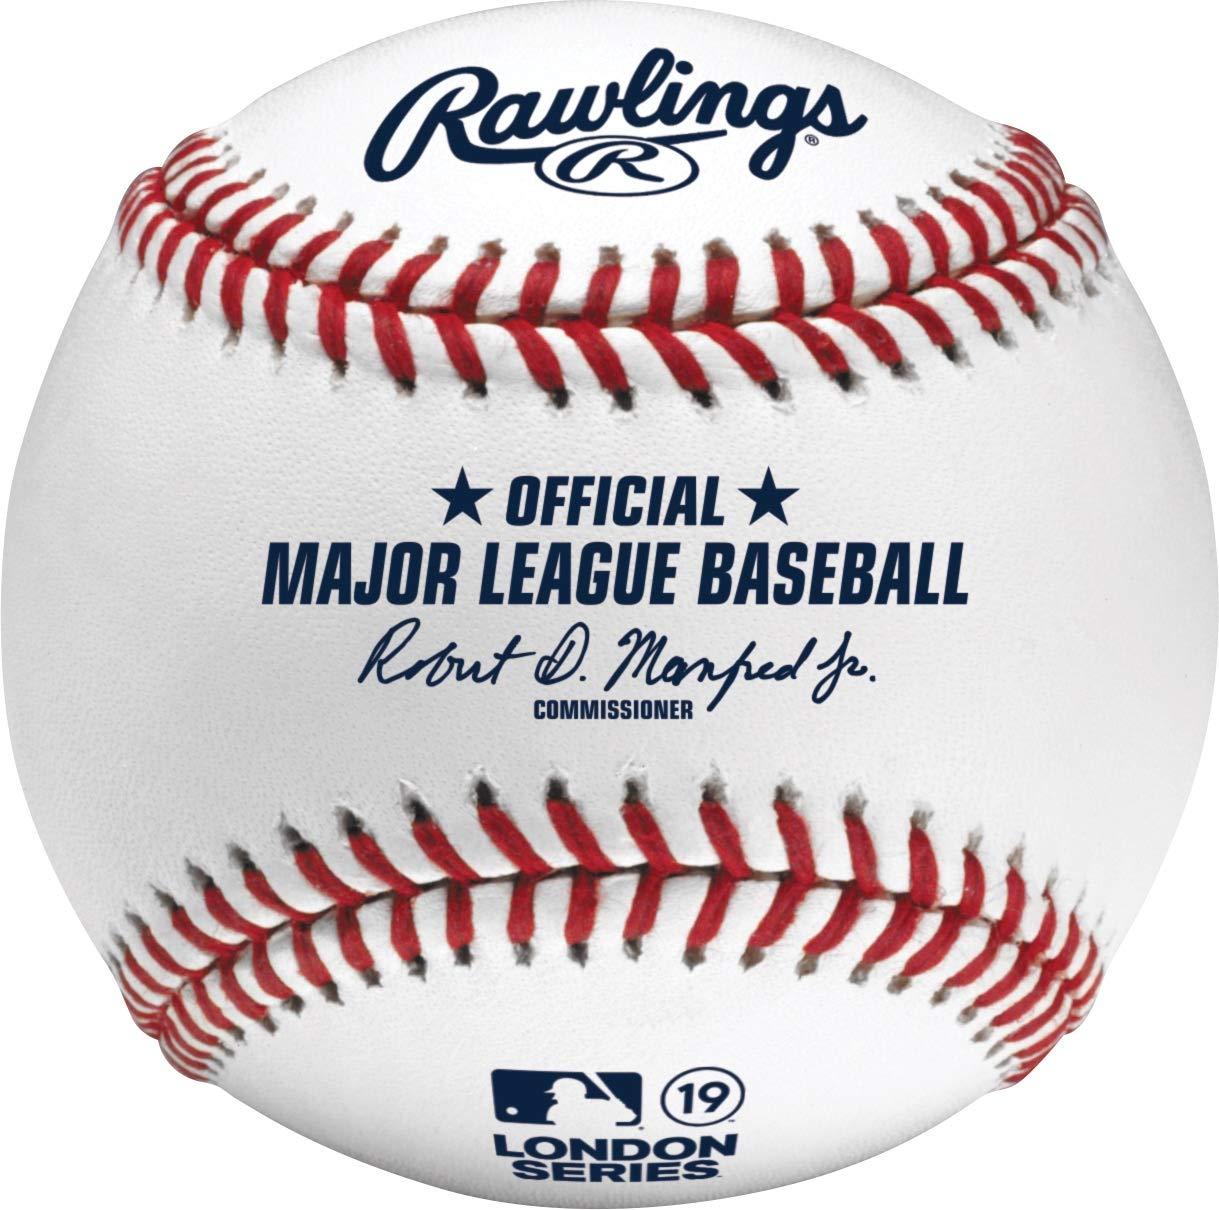 Rawlings 2019 ロンドンシリーズ レッドソックス ヤンキース 公式MLBゲーム 野球 - 箱入り